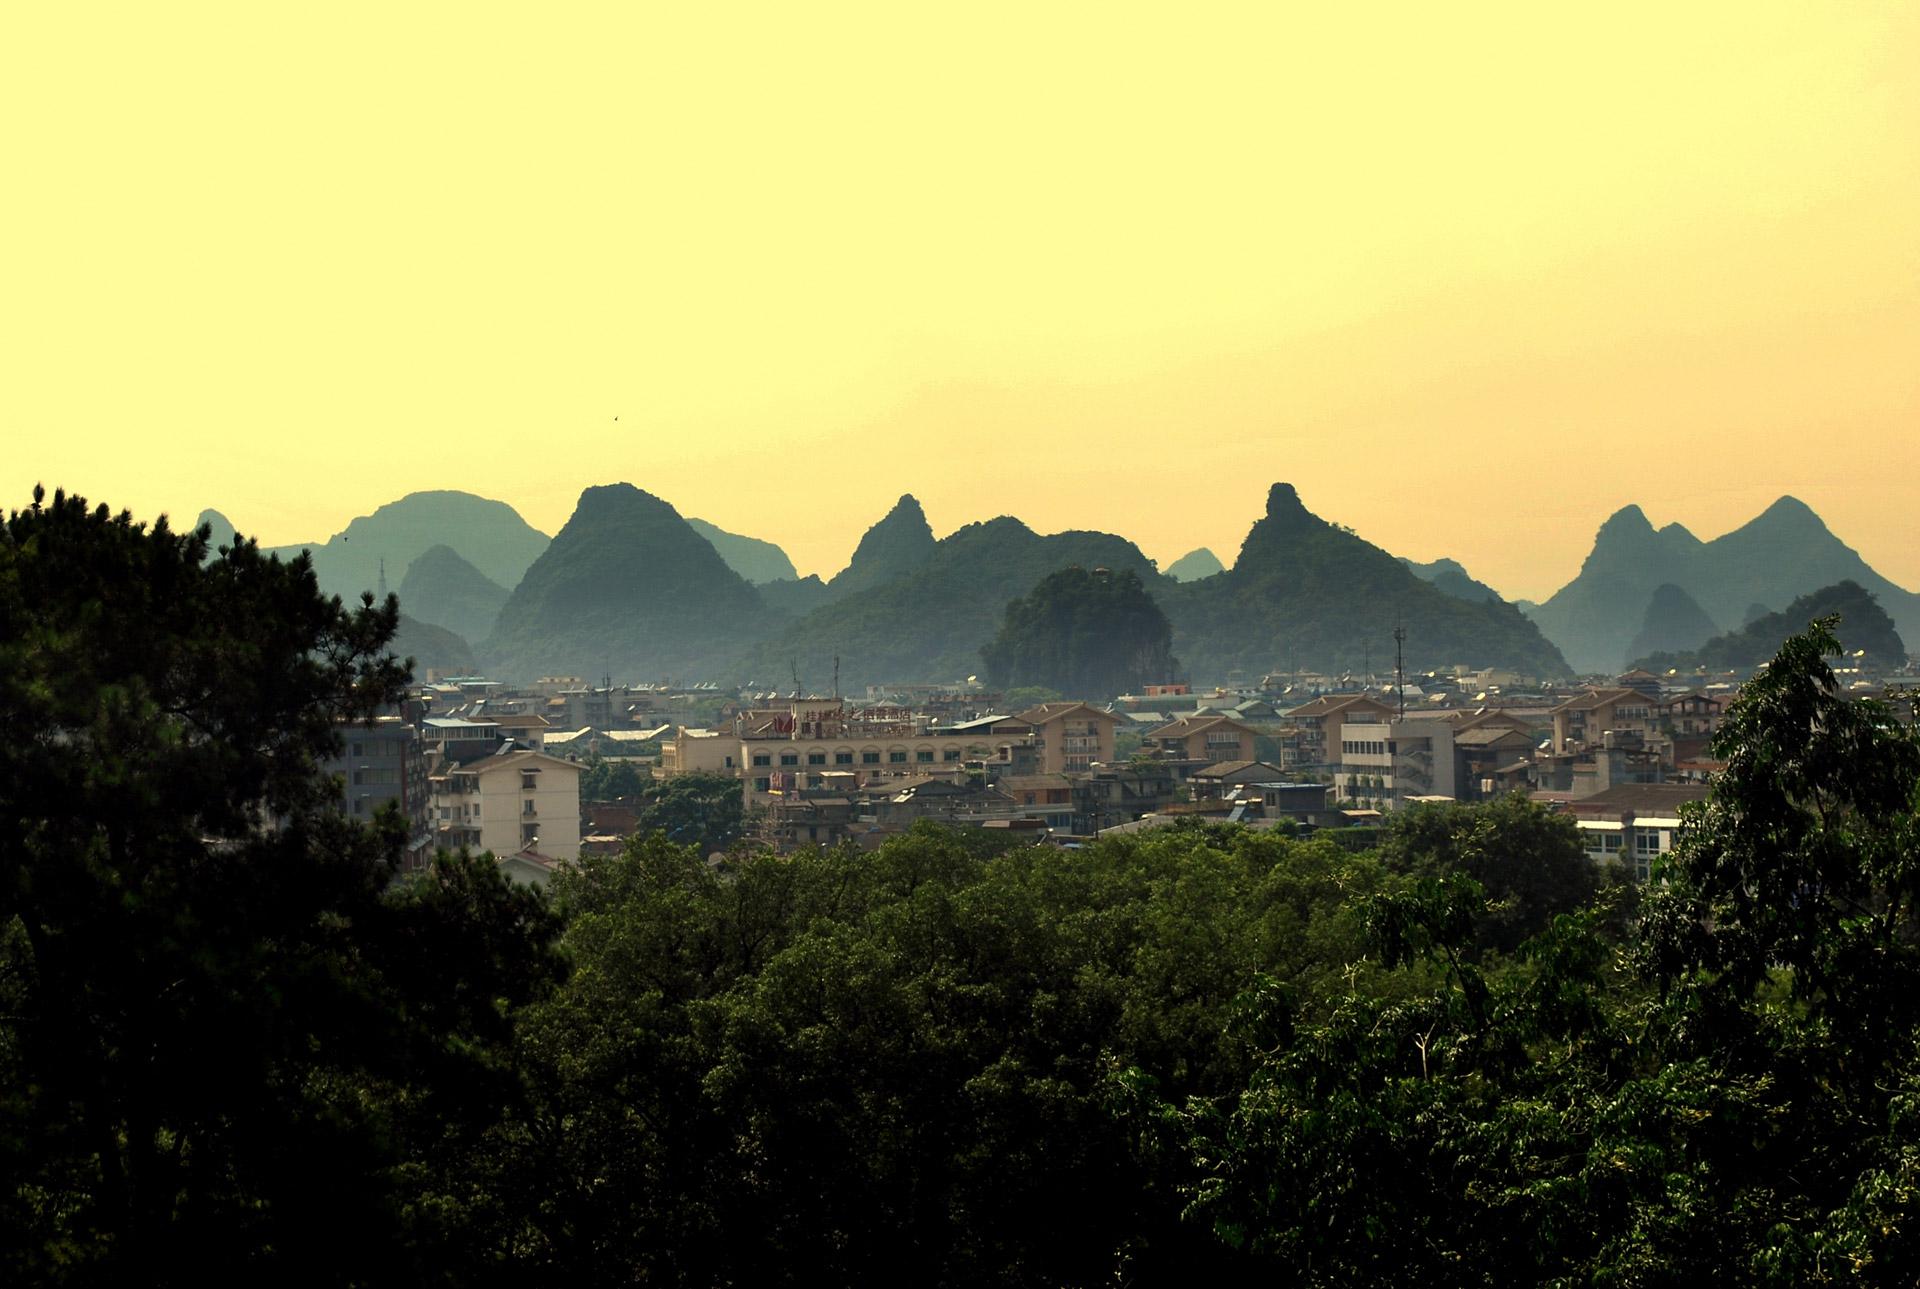 čína krajina